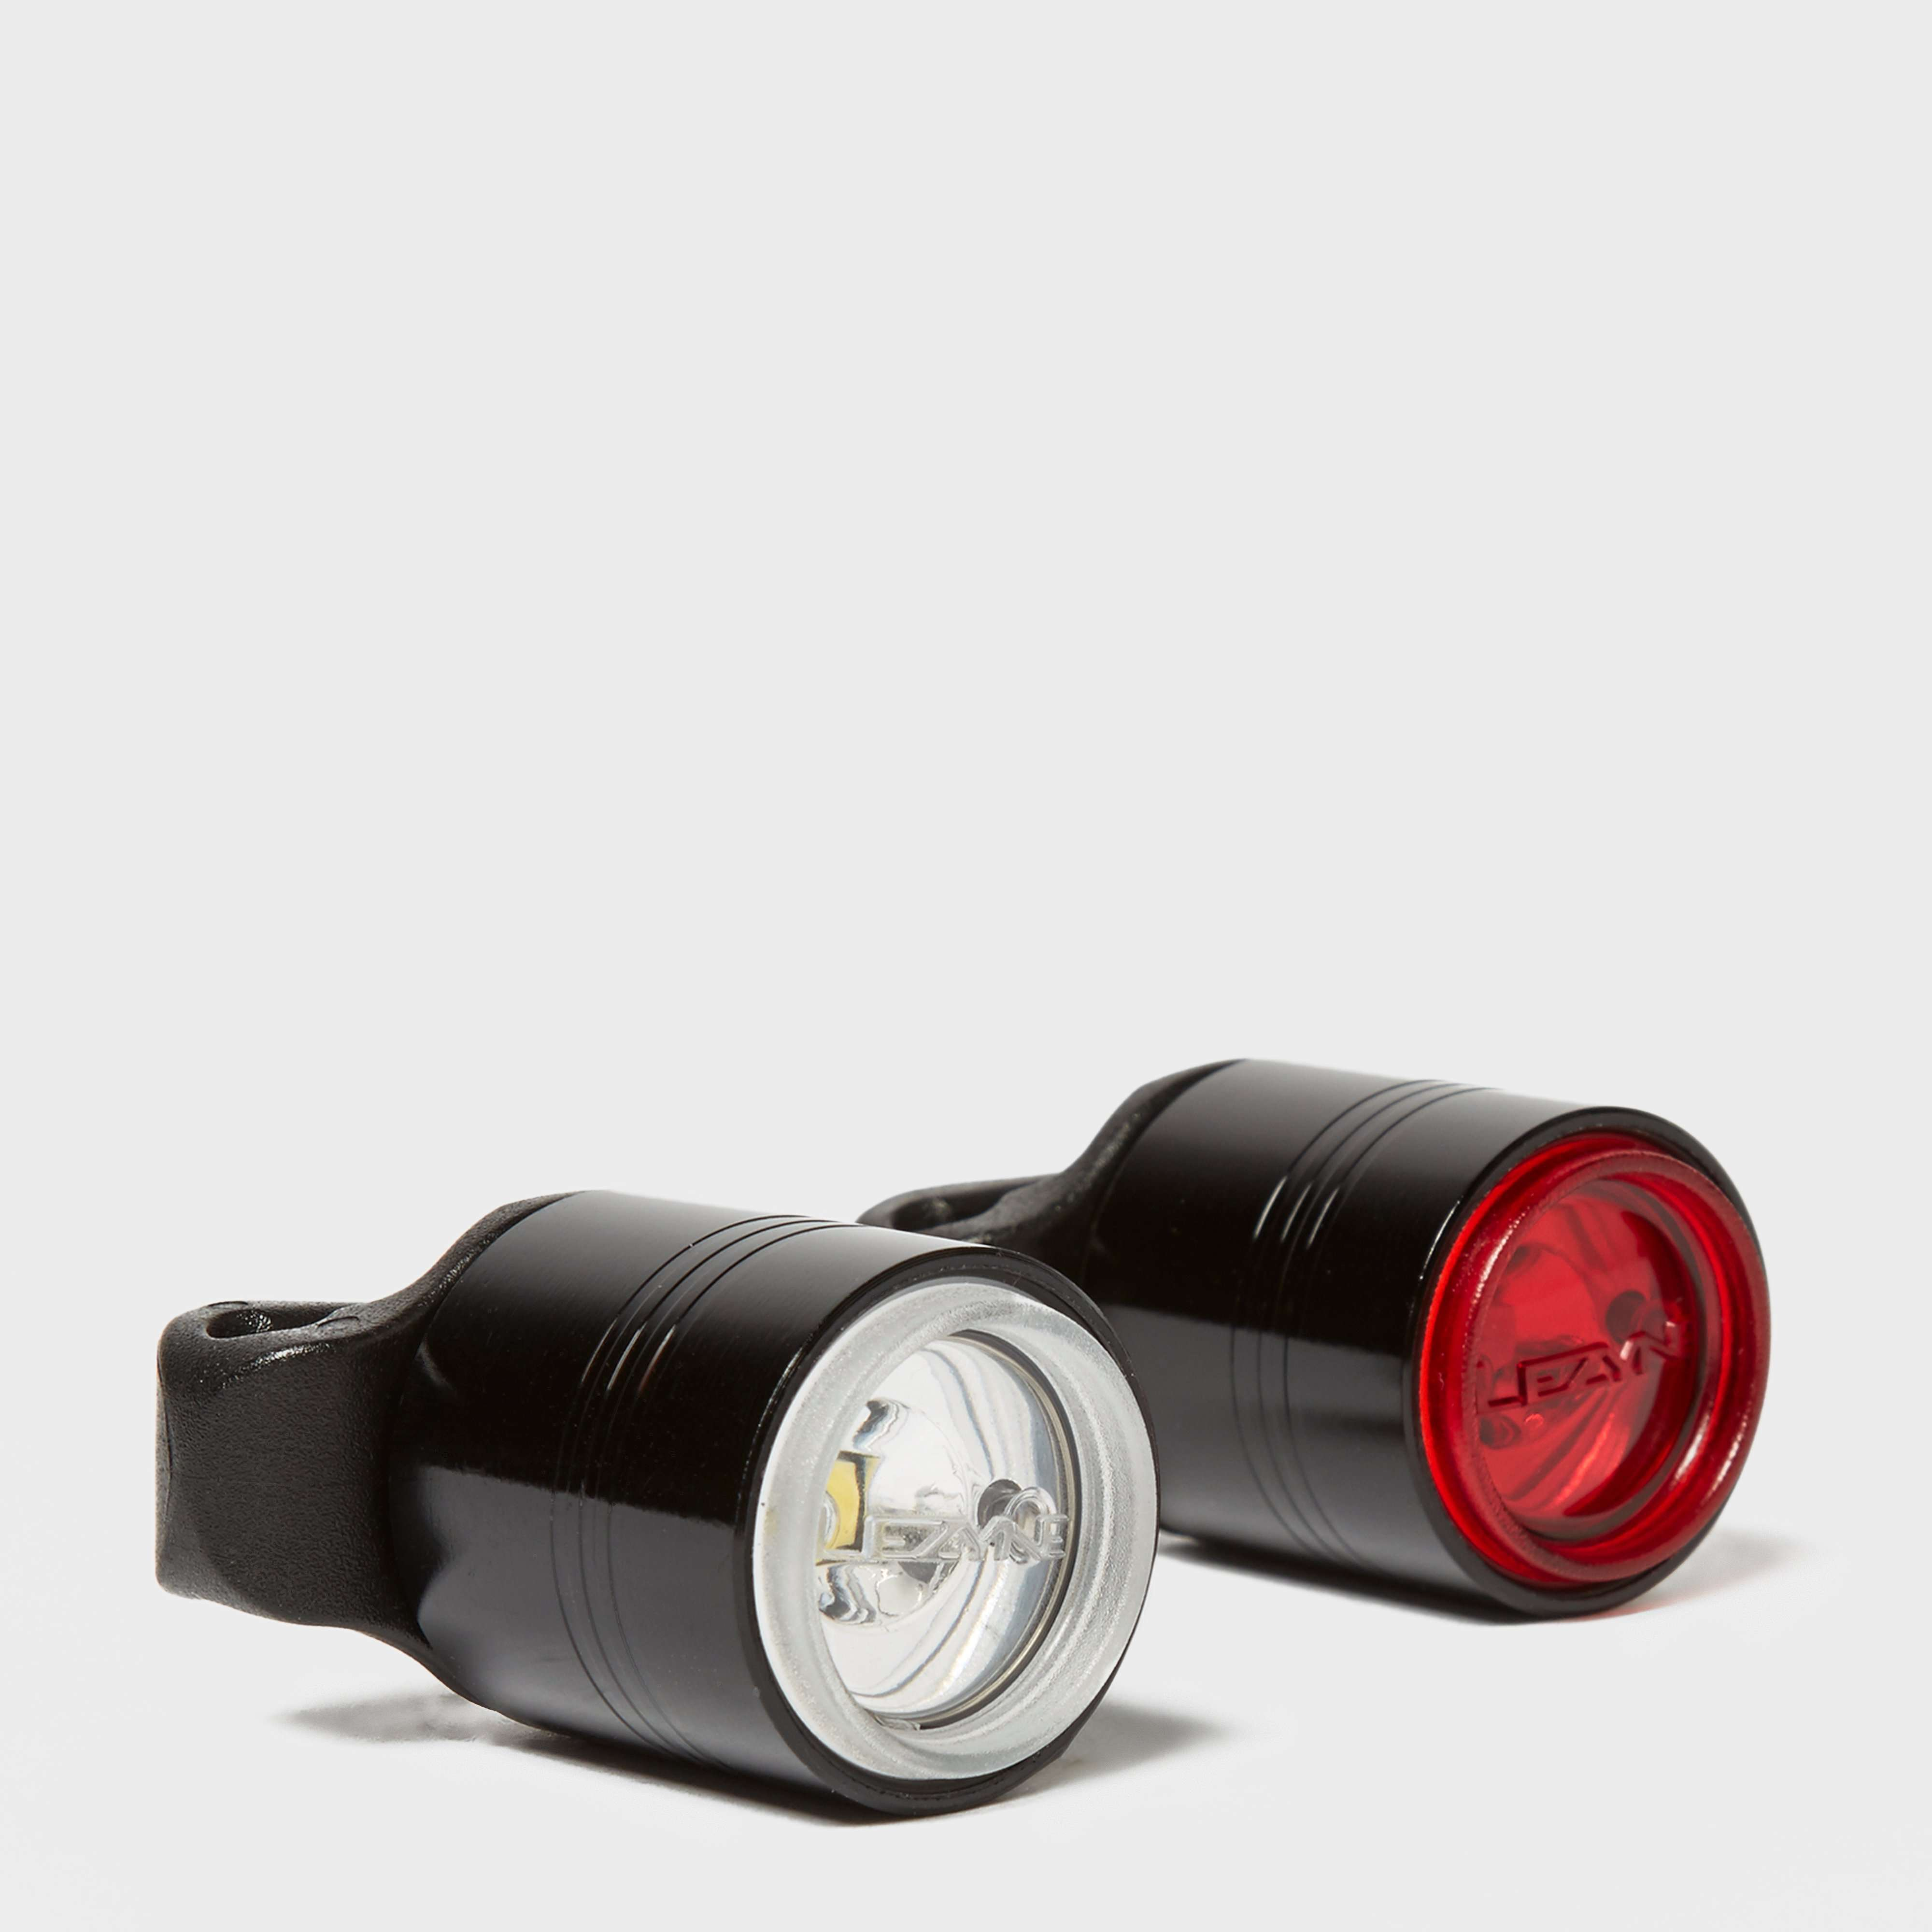 LEZYNE Femto Front and Rear Light Kit